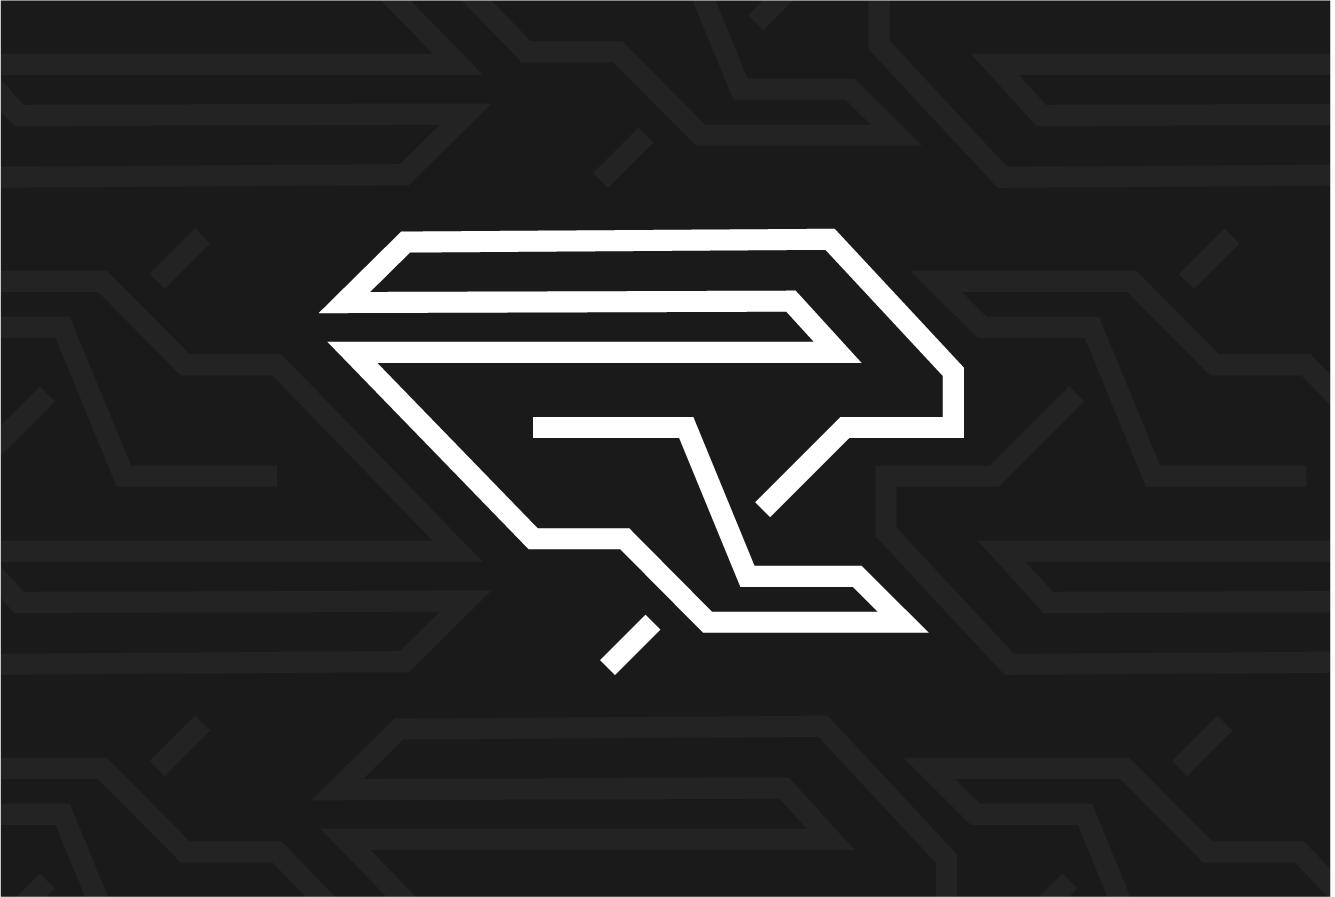 JR_JackRabbitRebrand2_Logo_BW_1218-01.jpg